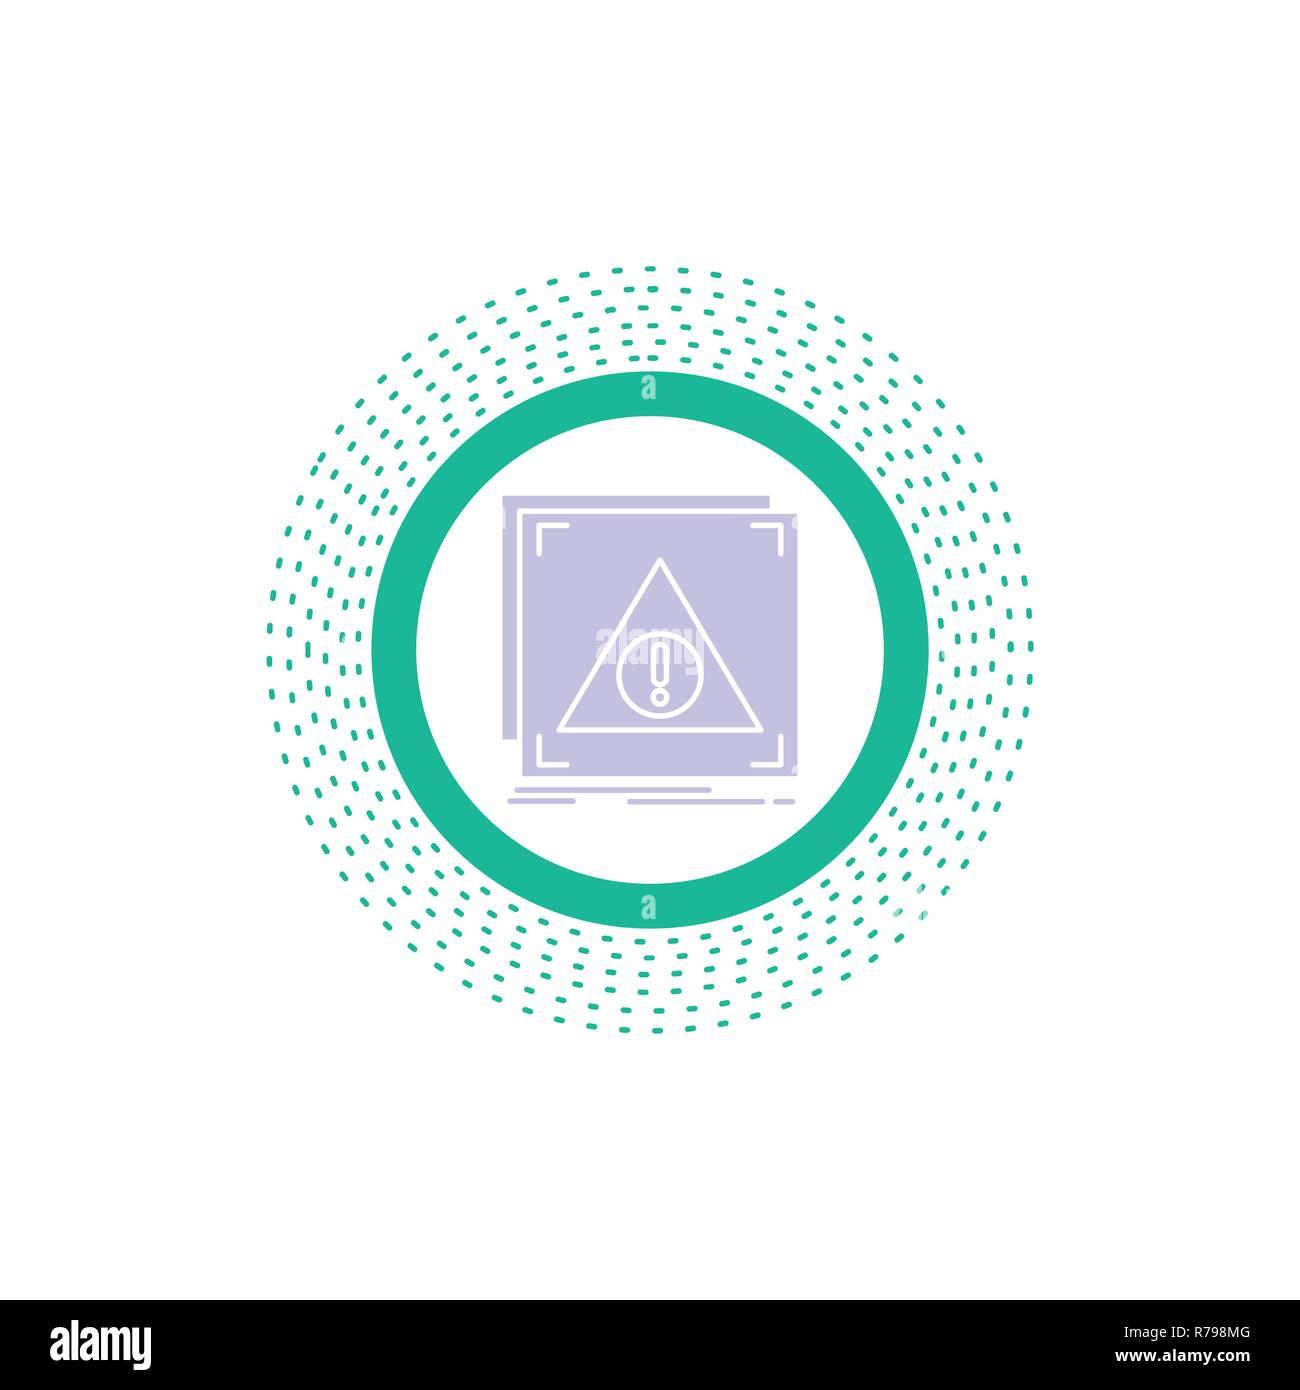 Error, Application, Denied, server, alert Glyph Icon. Vector isolated illustration - Stock Image